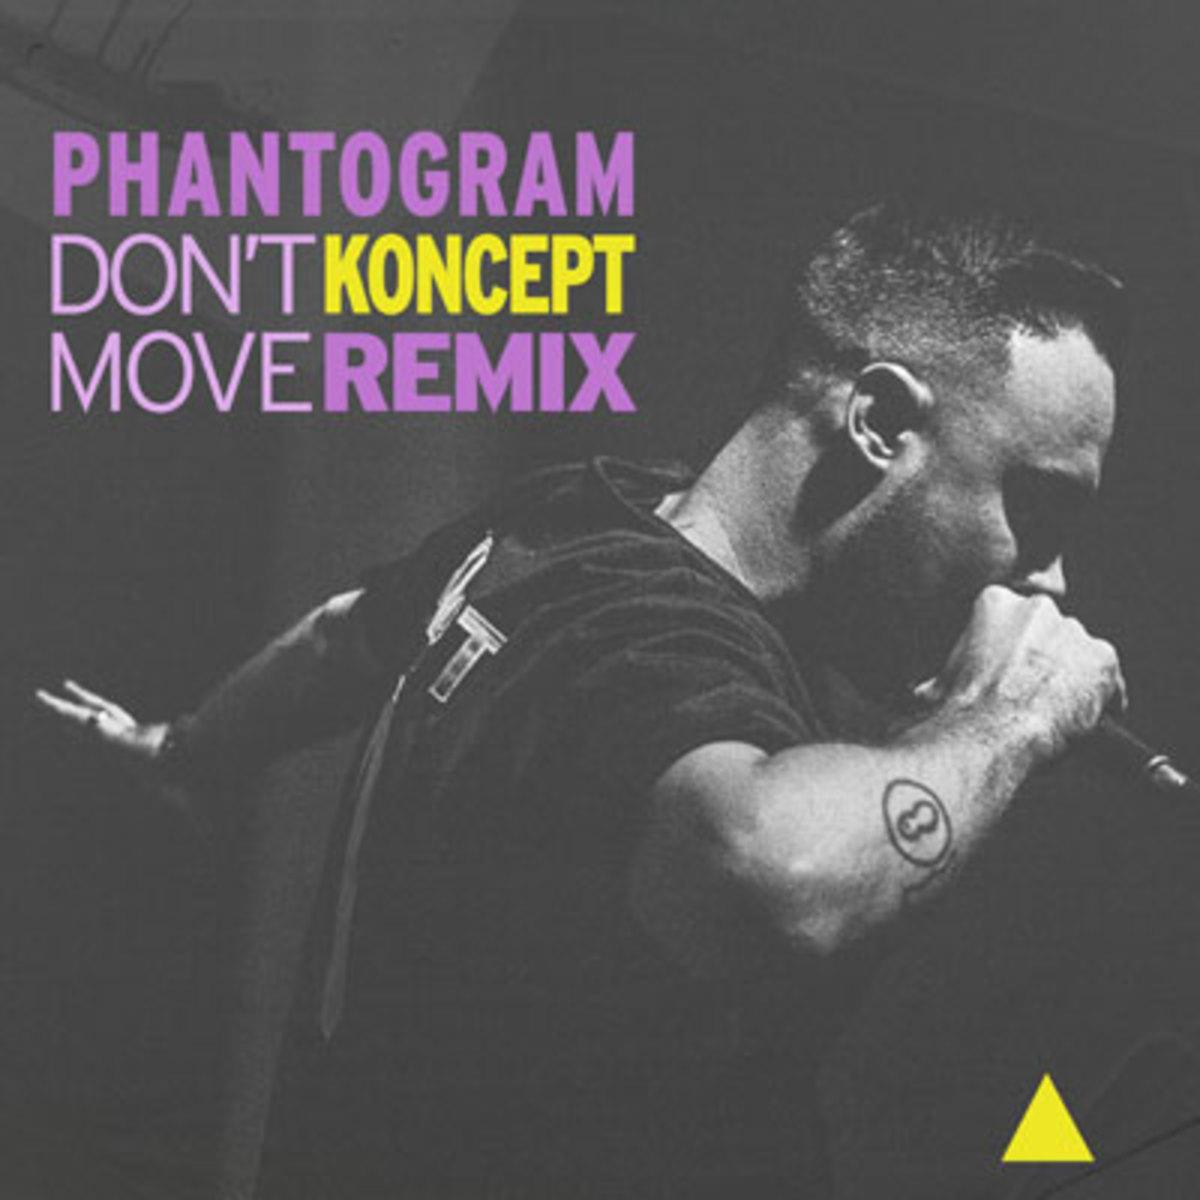 phantogram-dont-move-koncept-remix.jpg